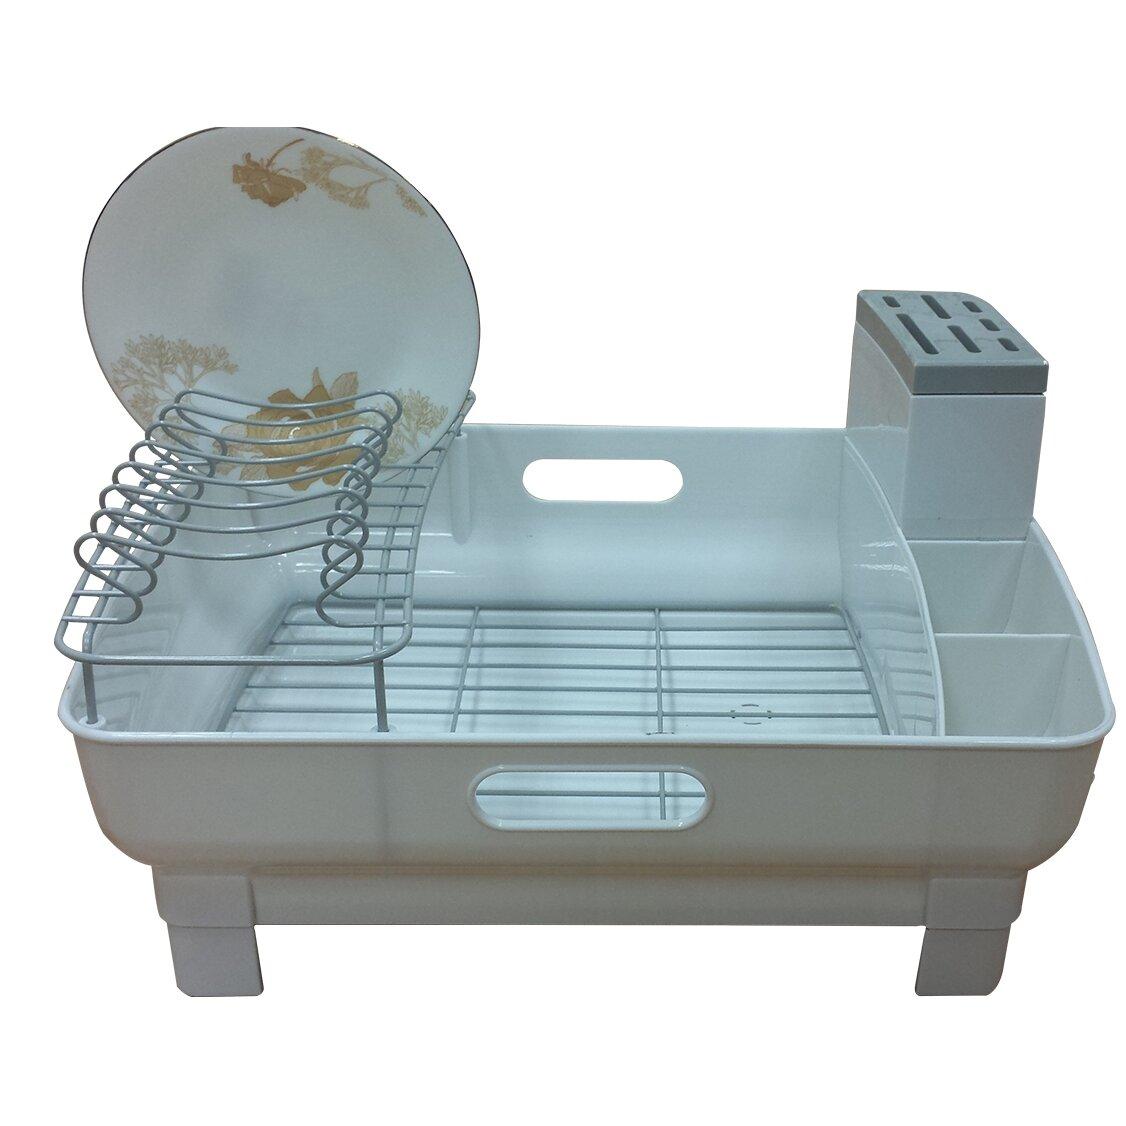 Drain Racks For Kitchen Sinks Dish Racks Drainers Youll Love Wayfair